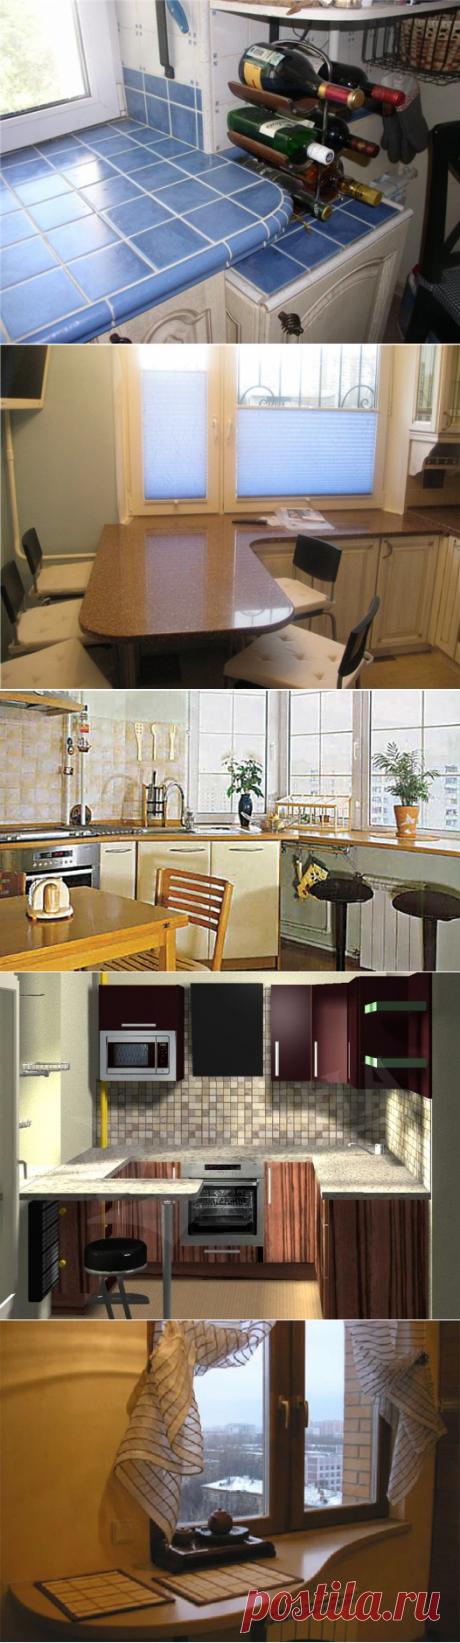 Кухонный стол вместо подоконника. Идеи.